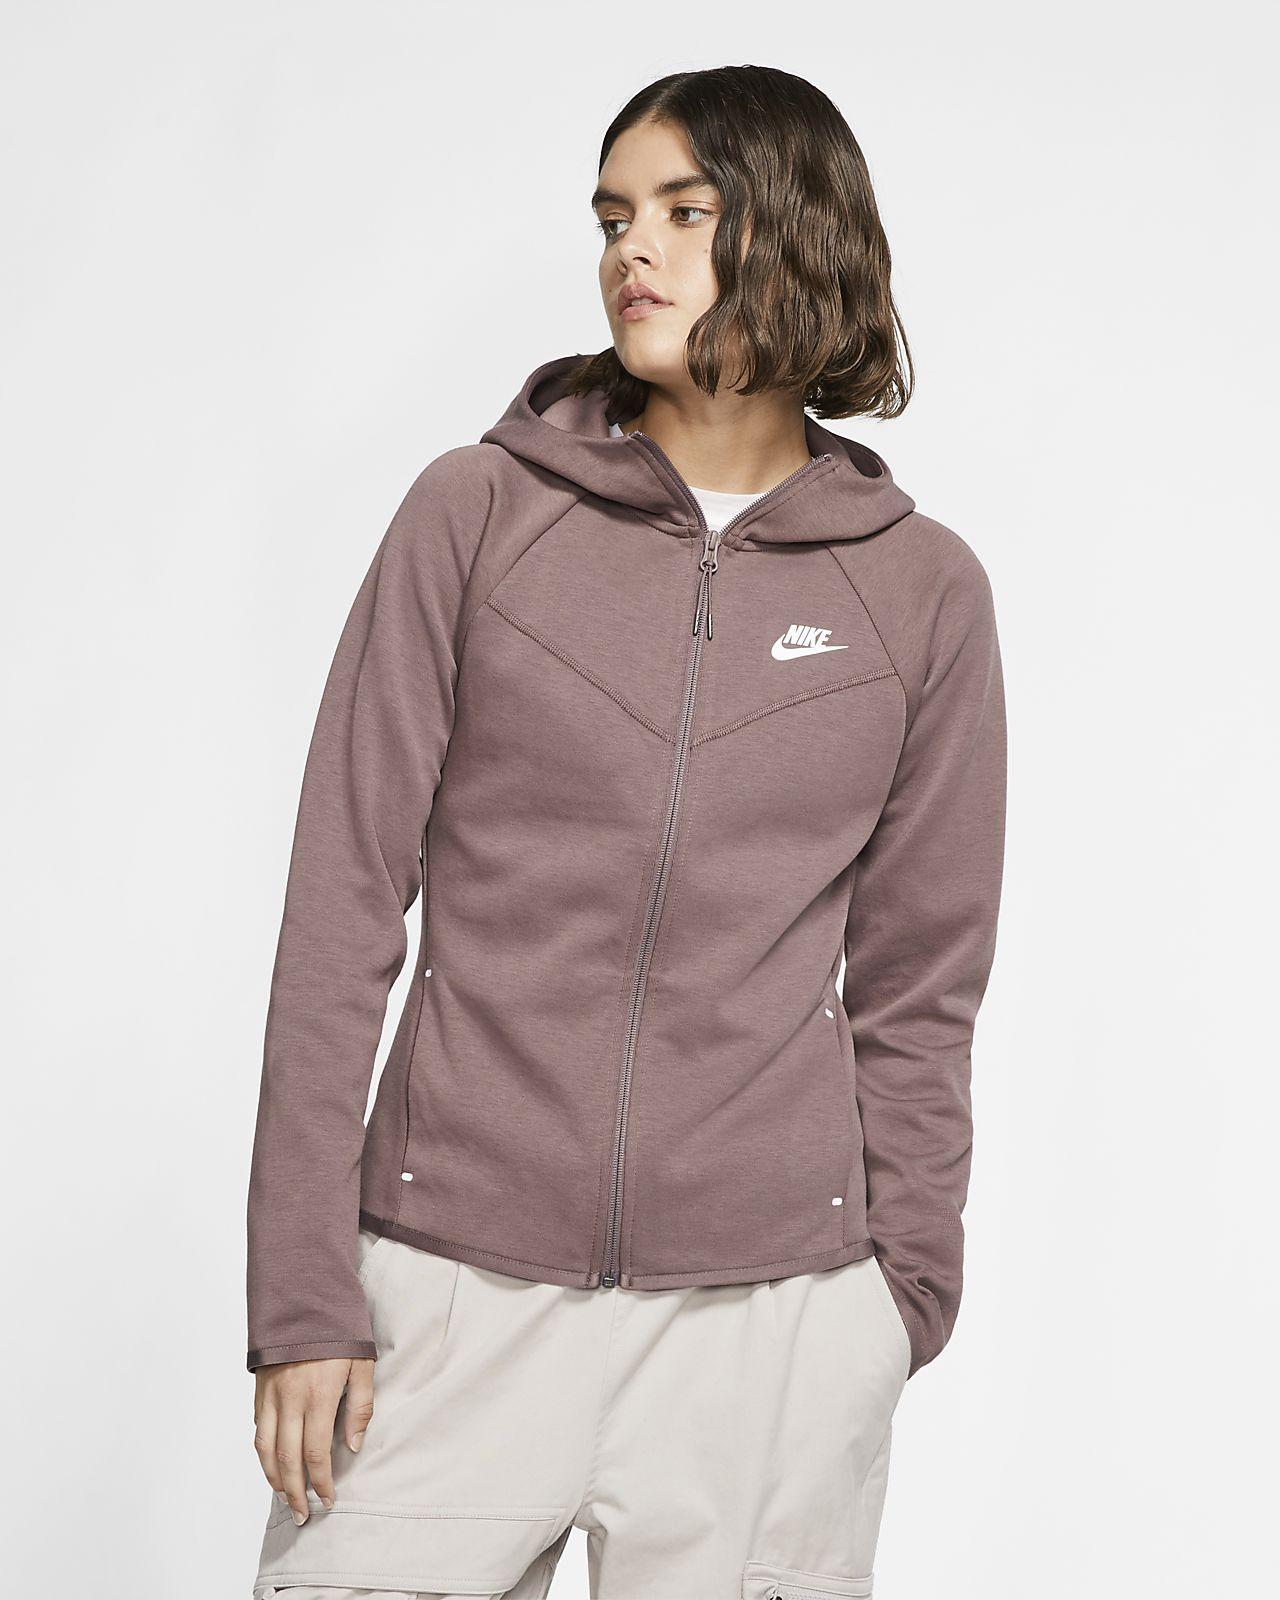 Nike Sportswear Windrunner Tech Fleece Sudadera con capucha y cremallera completa - Mujer